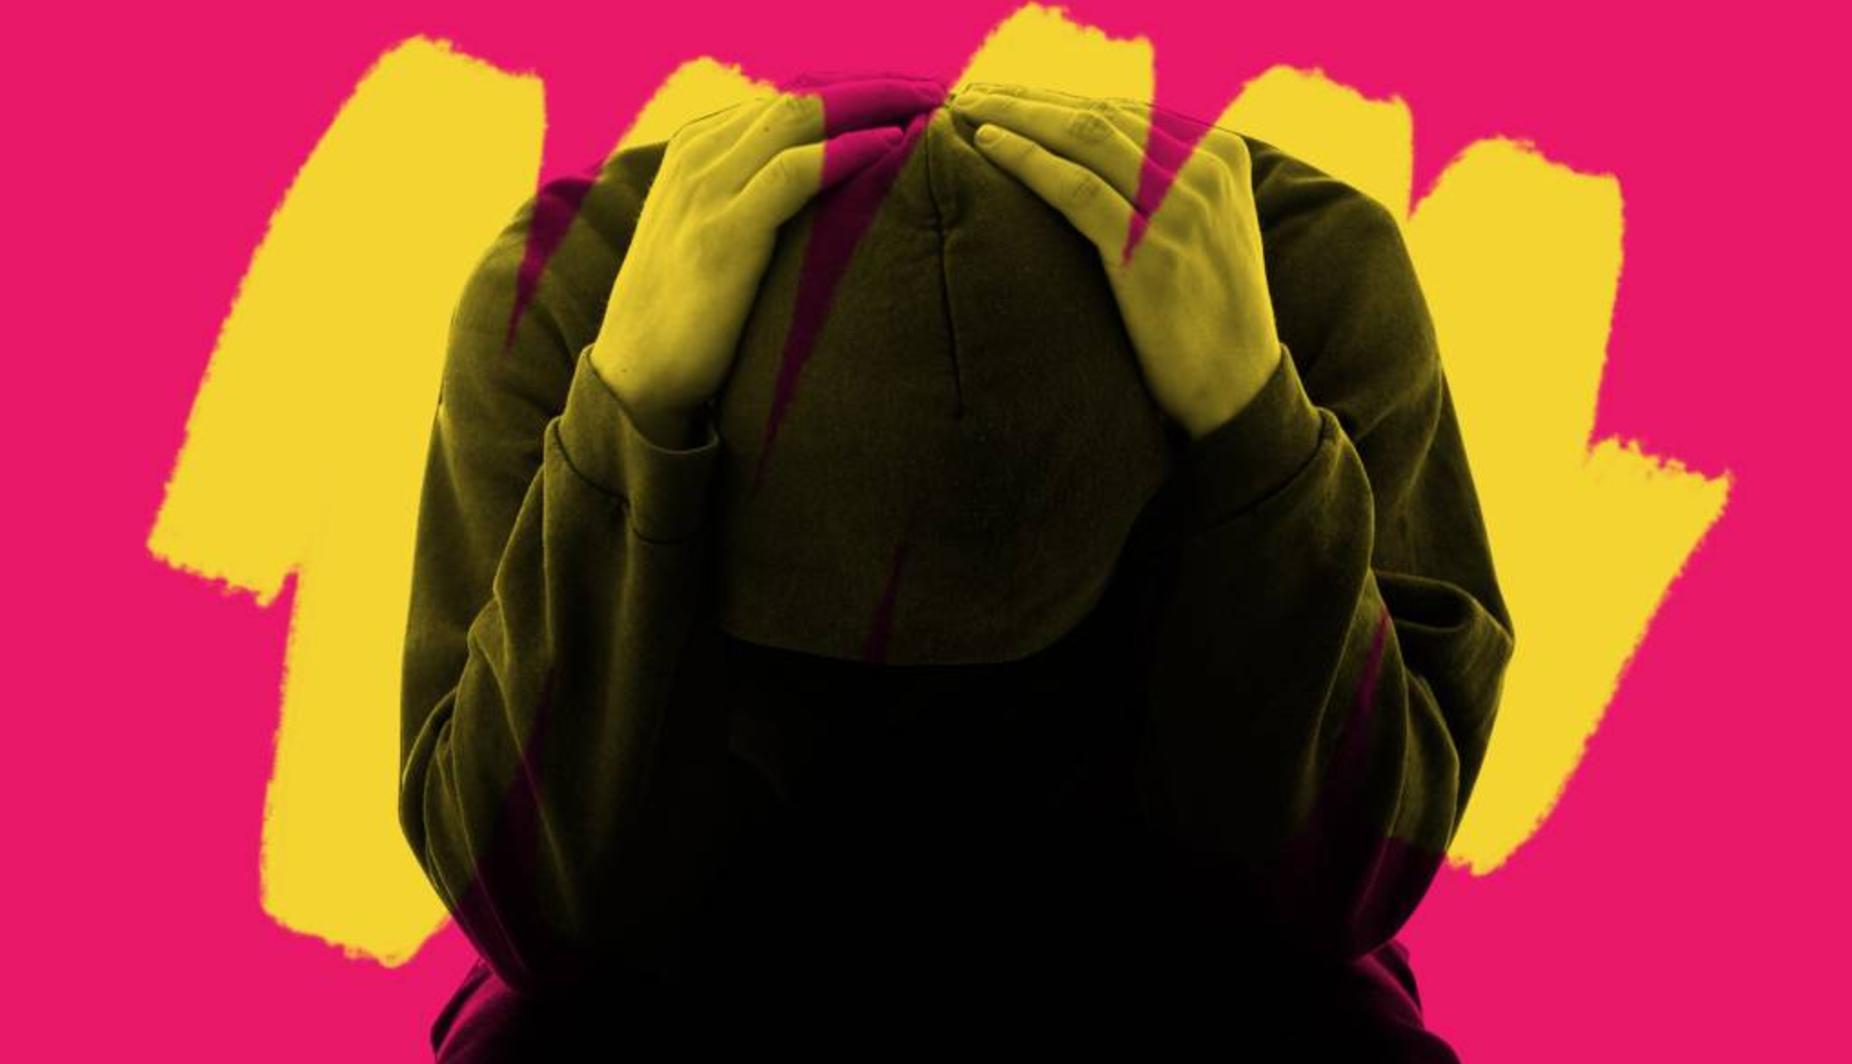 Panic Attacks: How I Handle Them - BBC Three